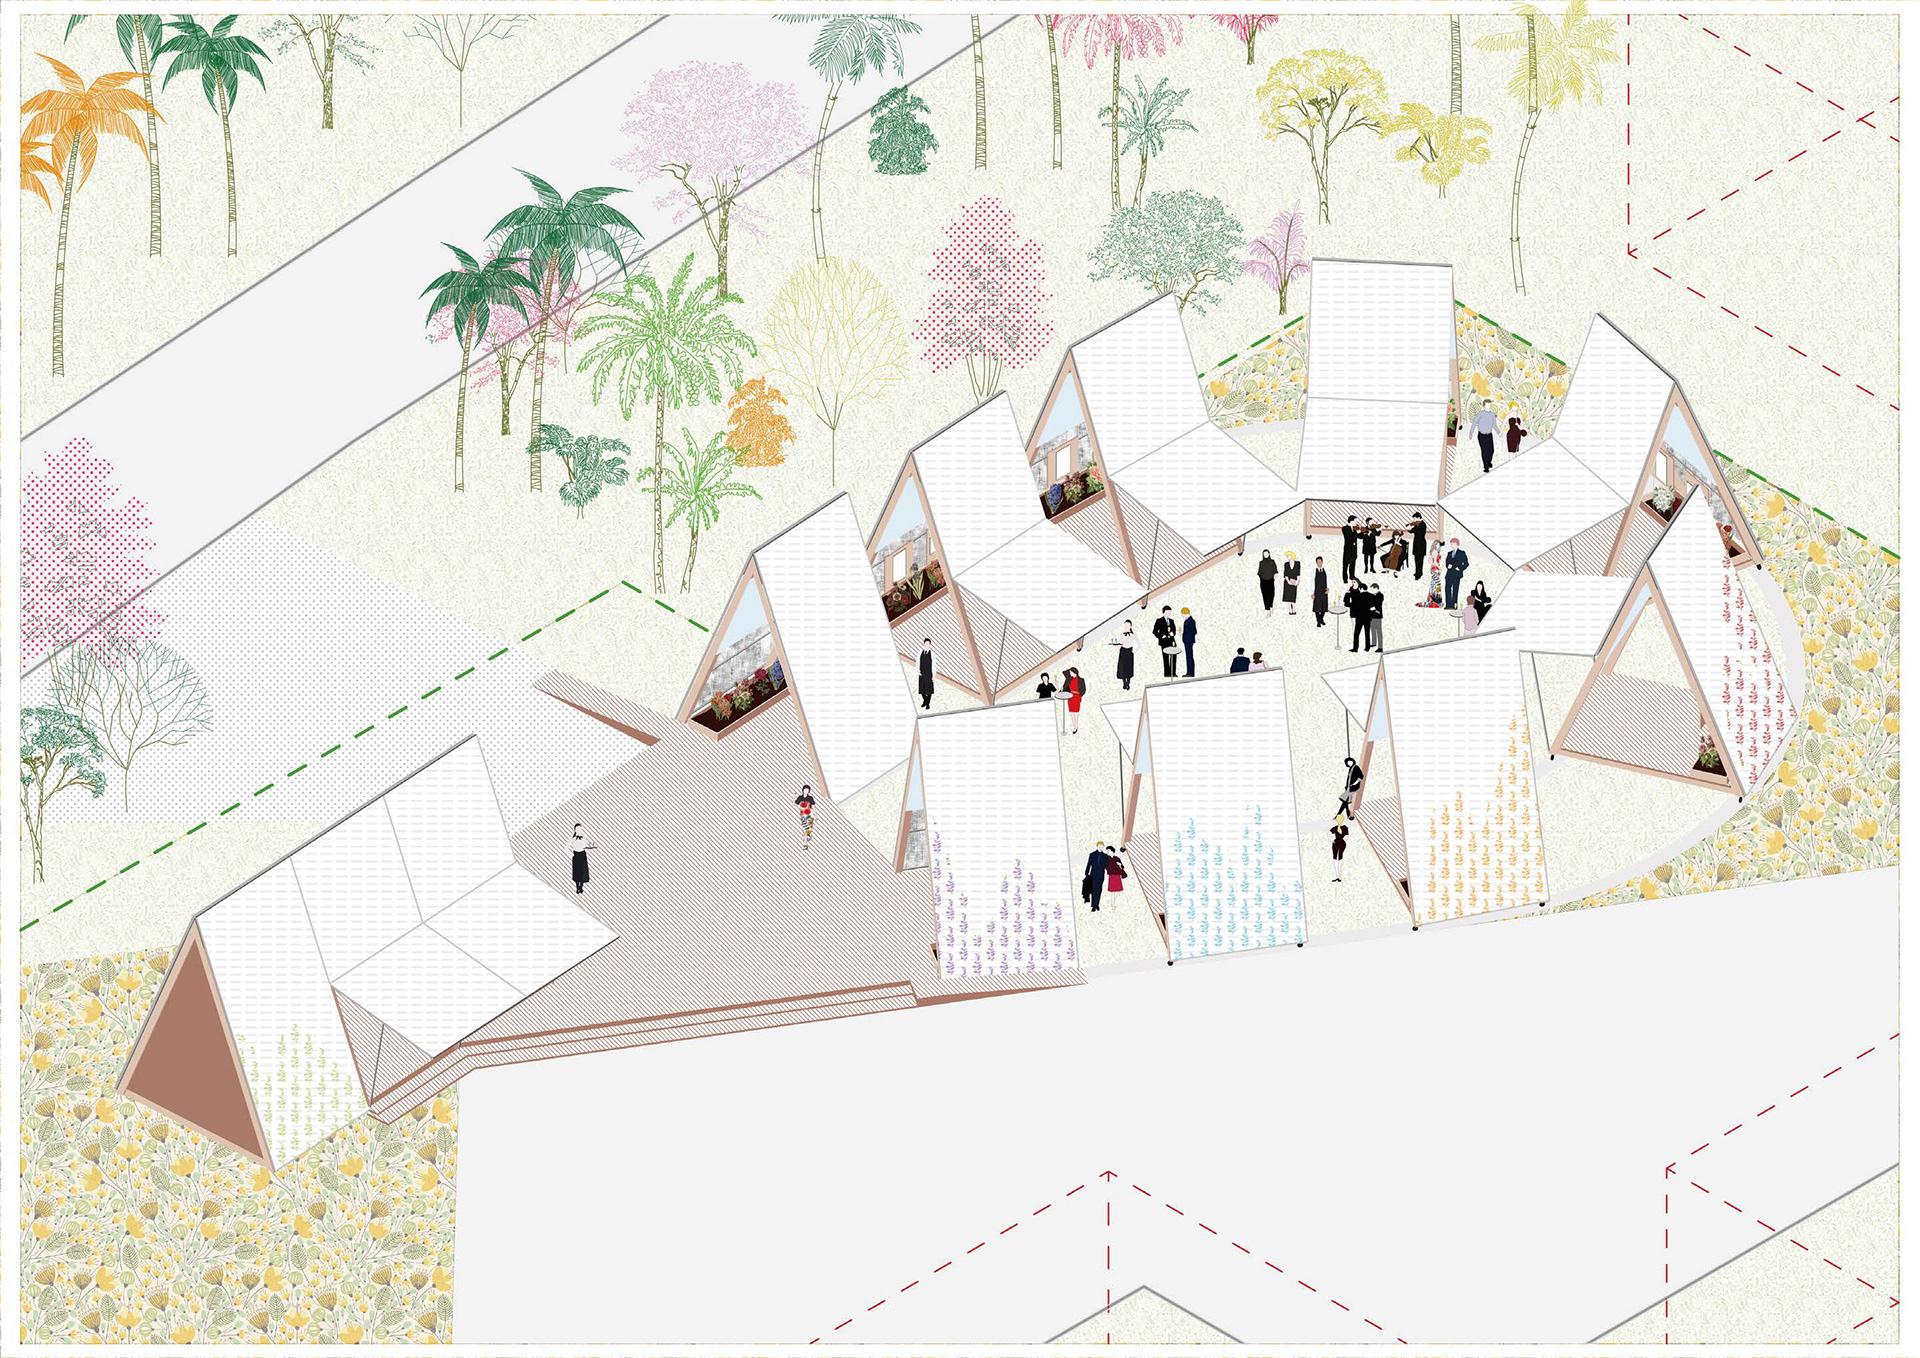 MAYU architects - Holland pavilion, 2018 Taichung Flora Expo